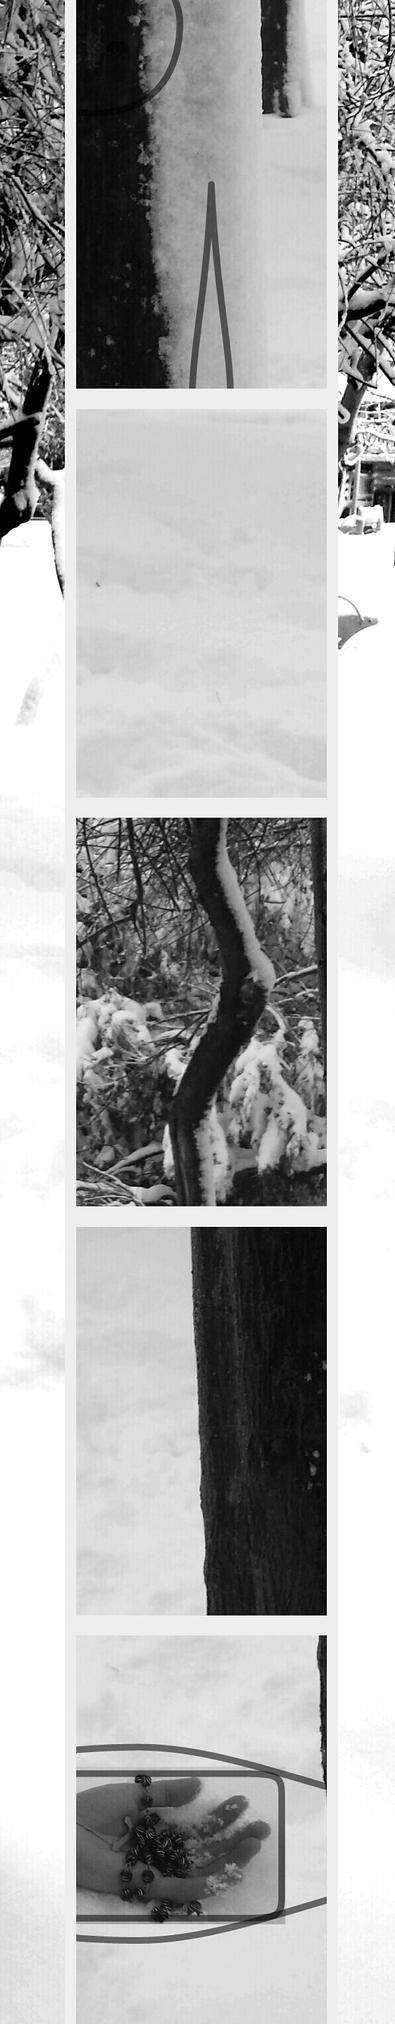 Forest vivisection C2 by june35DA